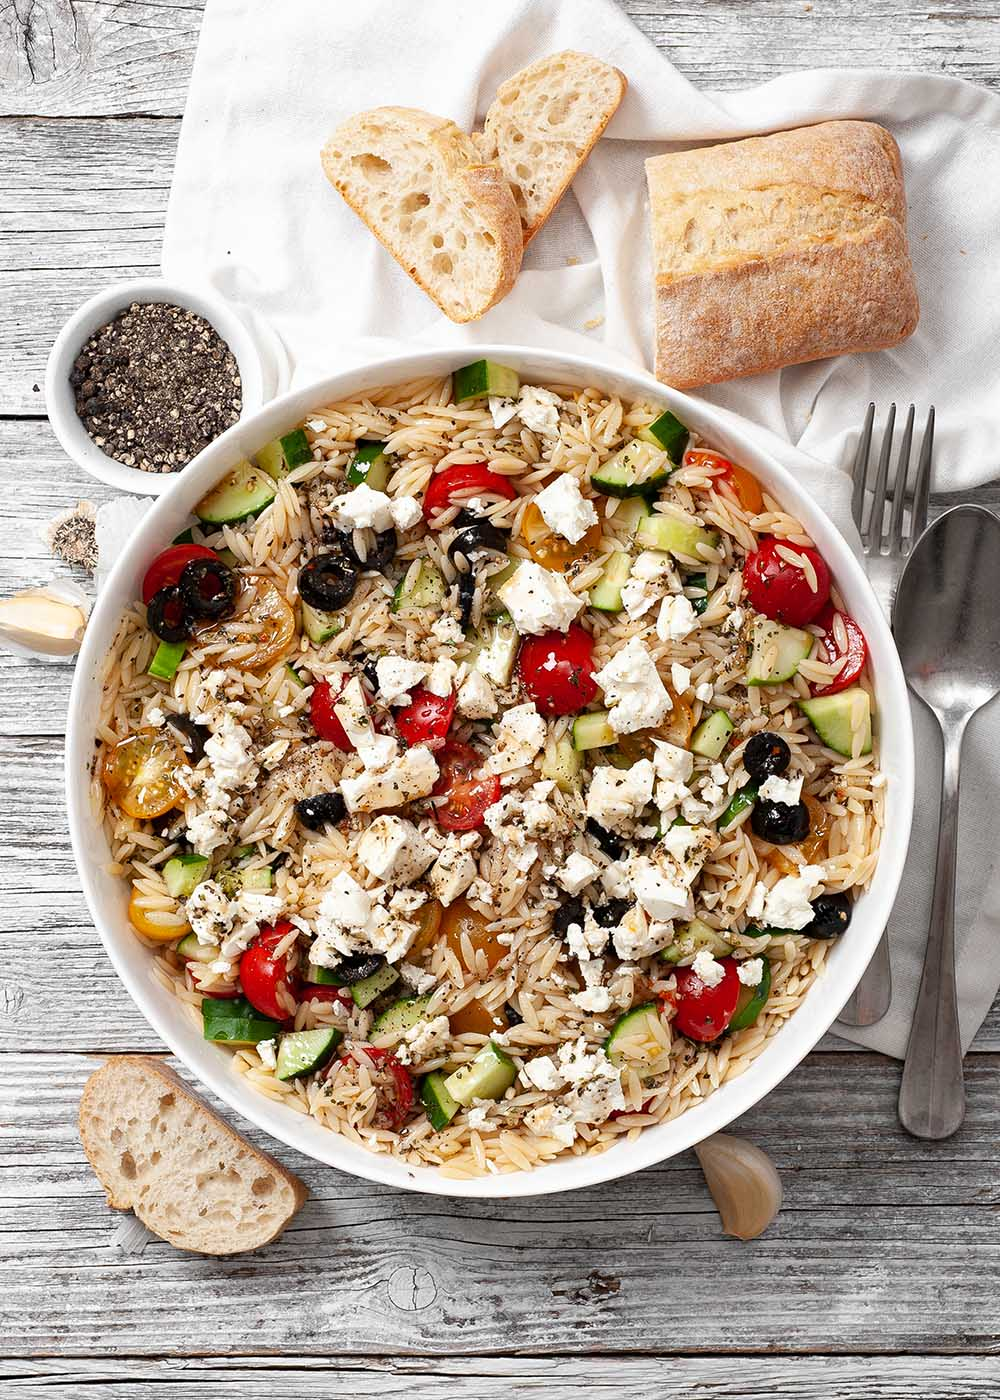 Orzo-Nudelsalat mit Oliven und Feta 1